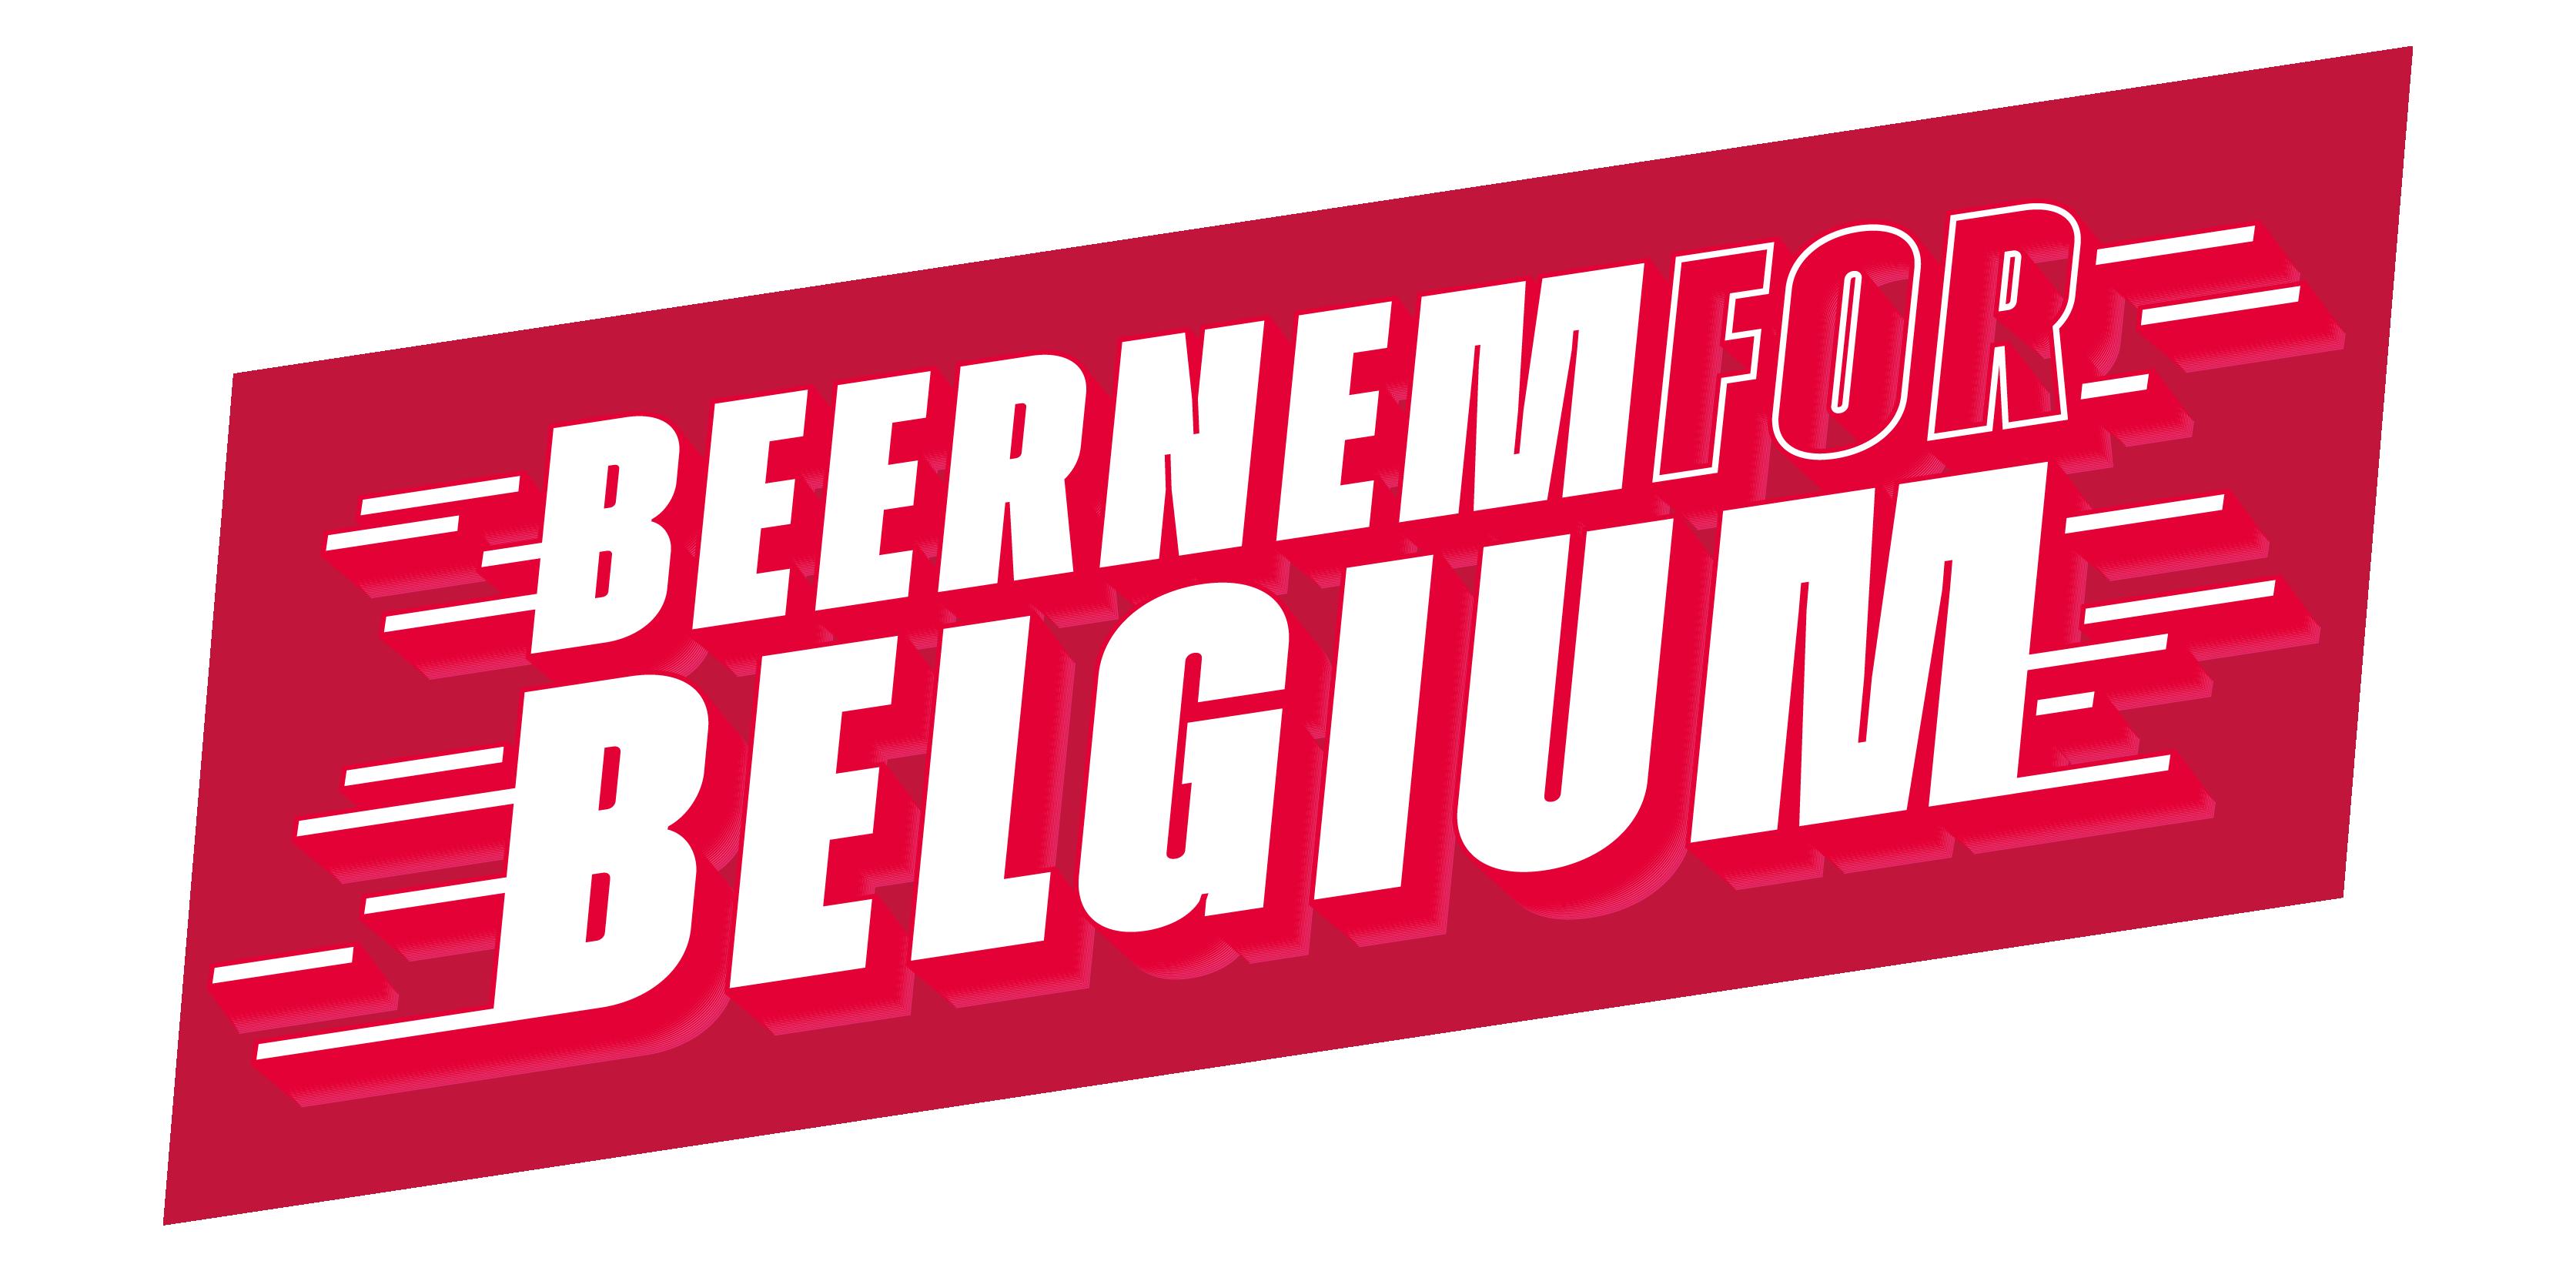 Beernem for Belgium!